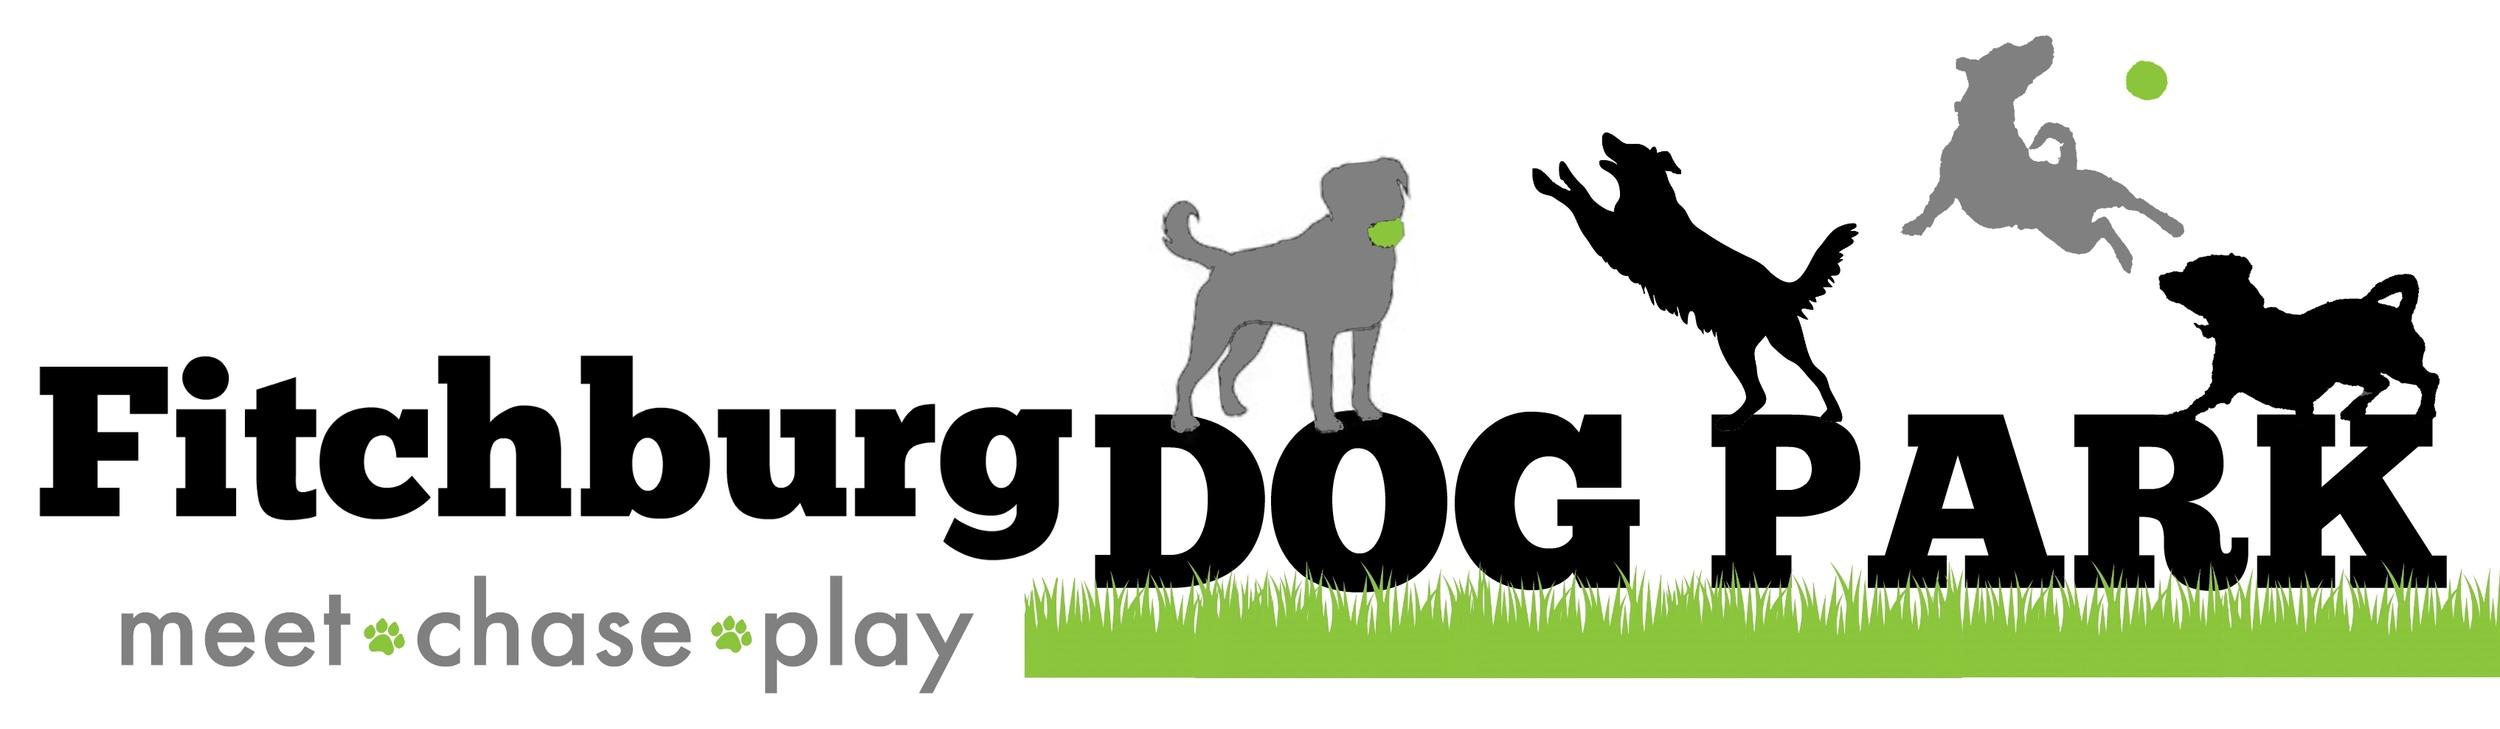 Fitchburgdogparklonglogo